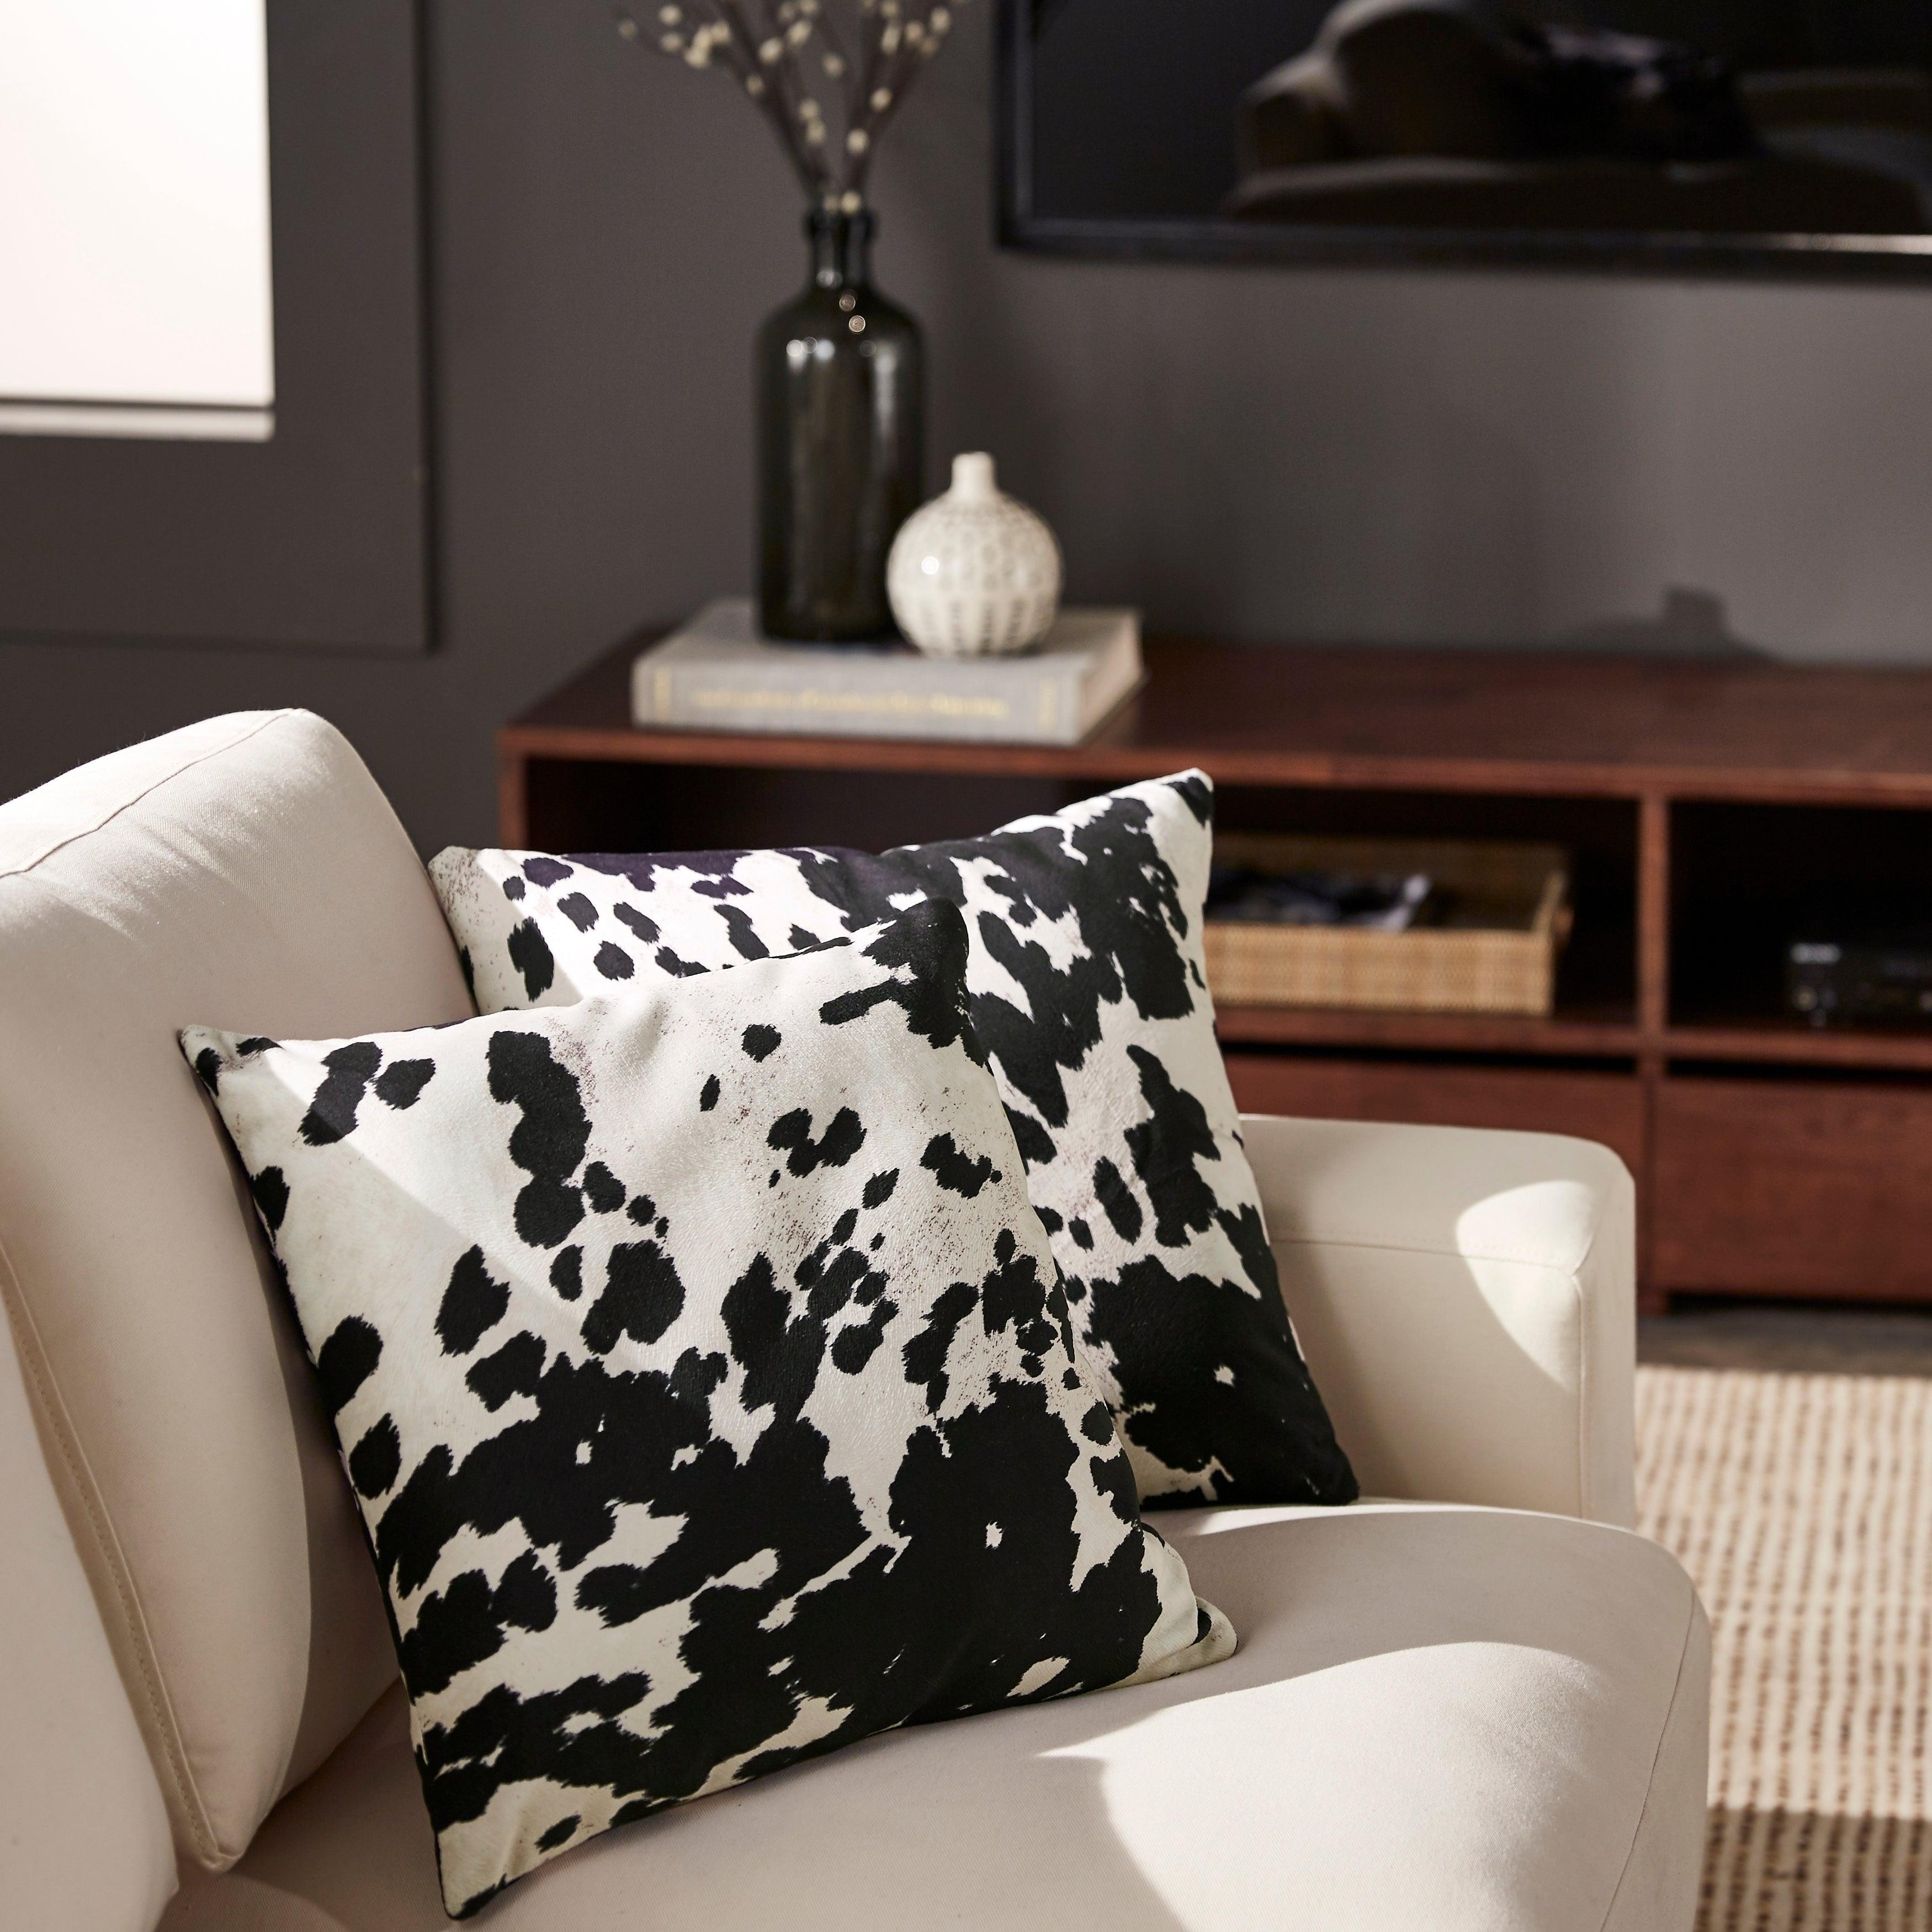 Black and White Faux Cow Hide Print Decorative Pillows (S...